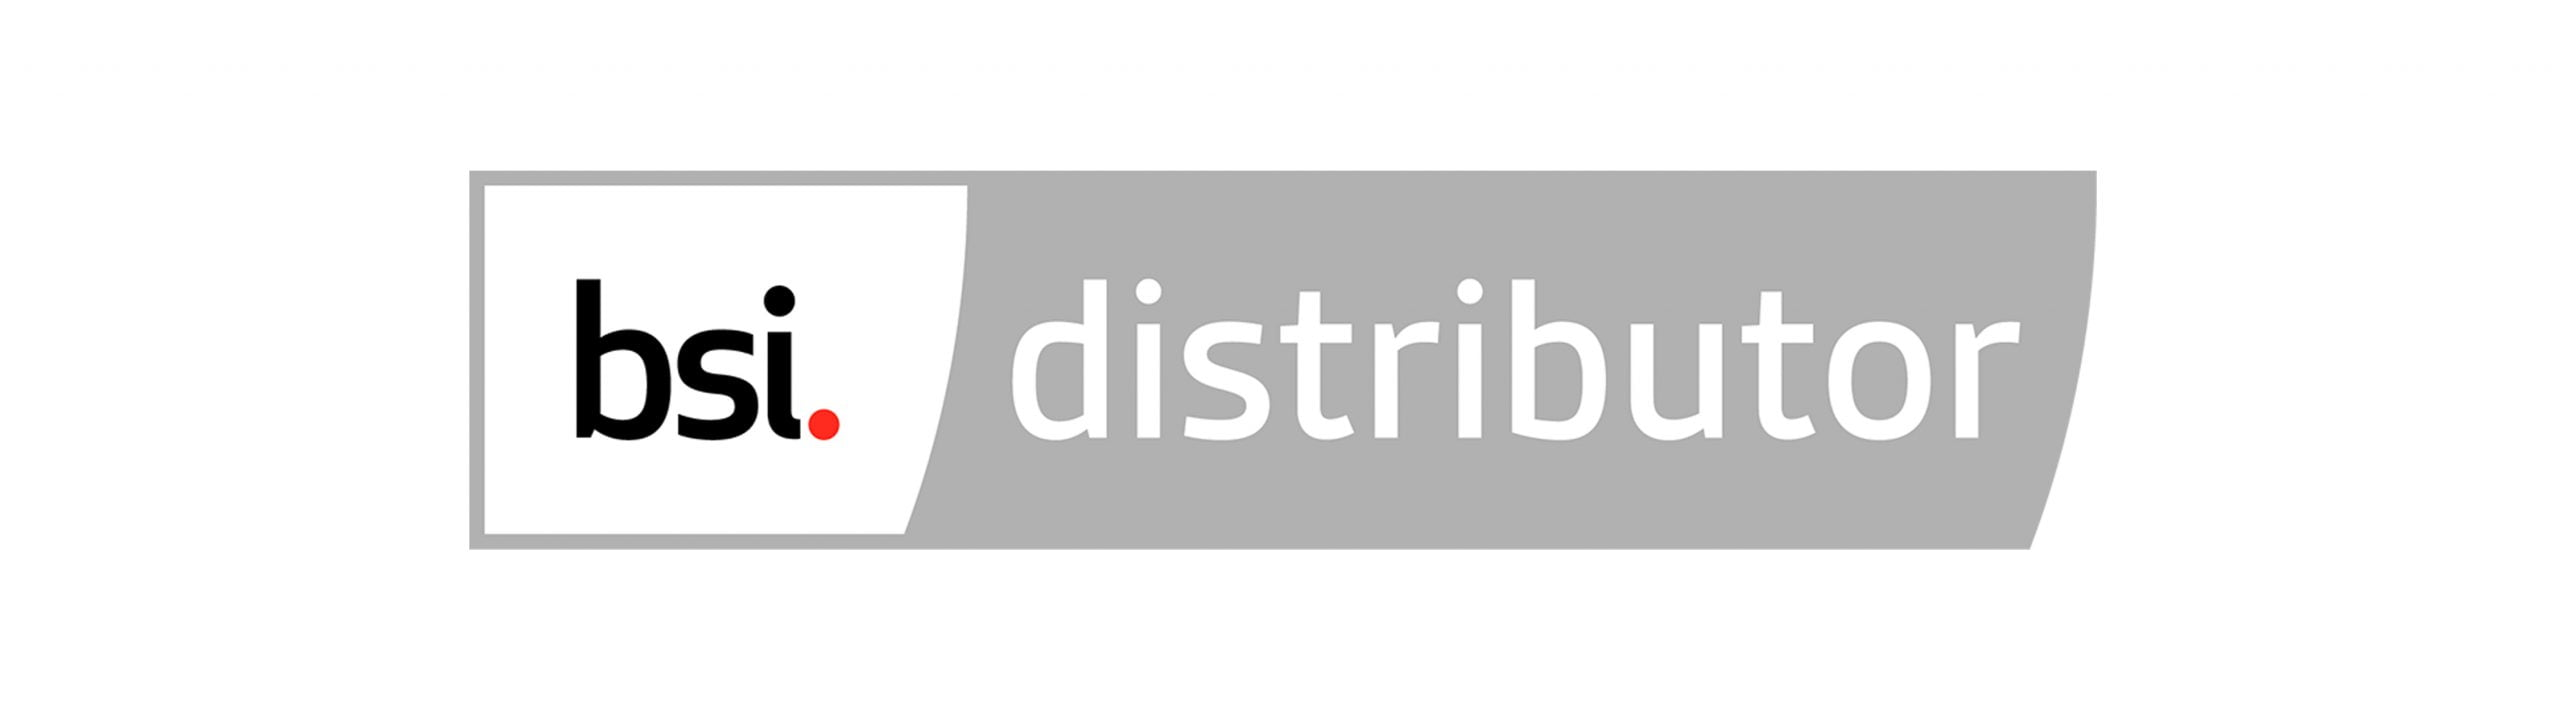 Distributor_Horizontal_RGB